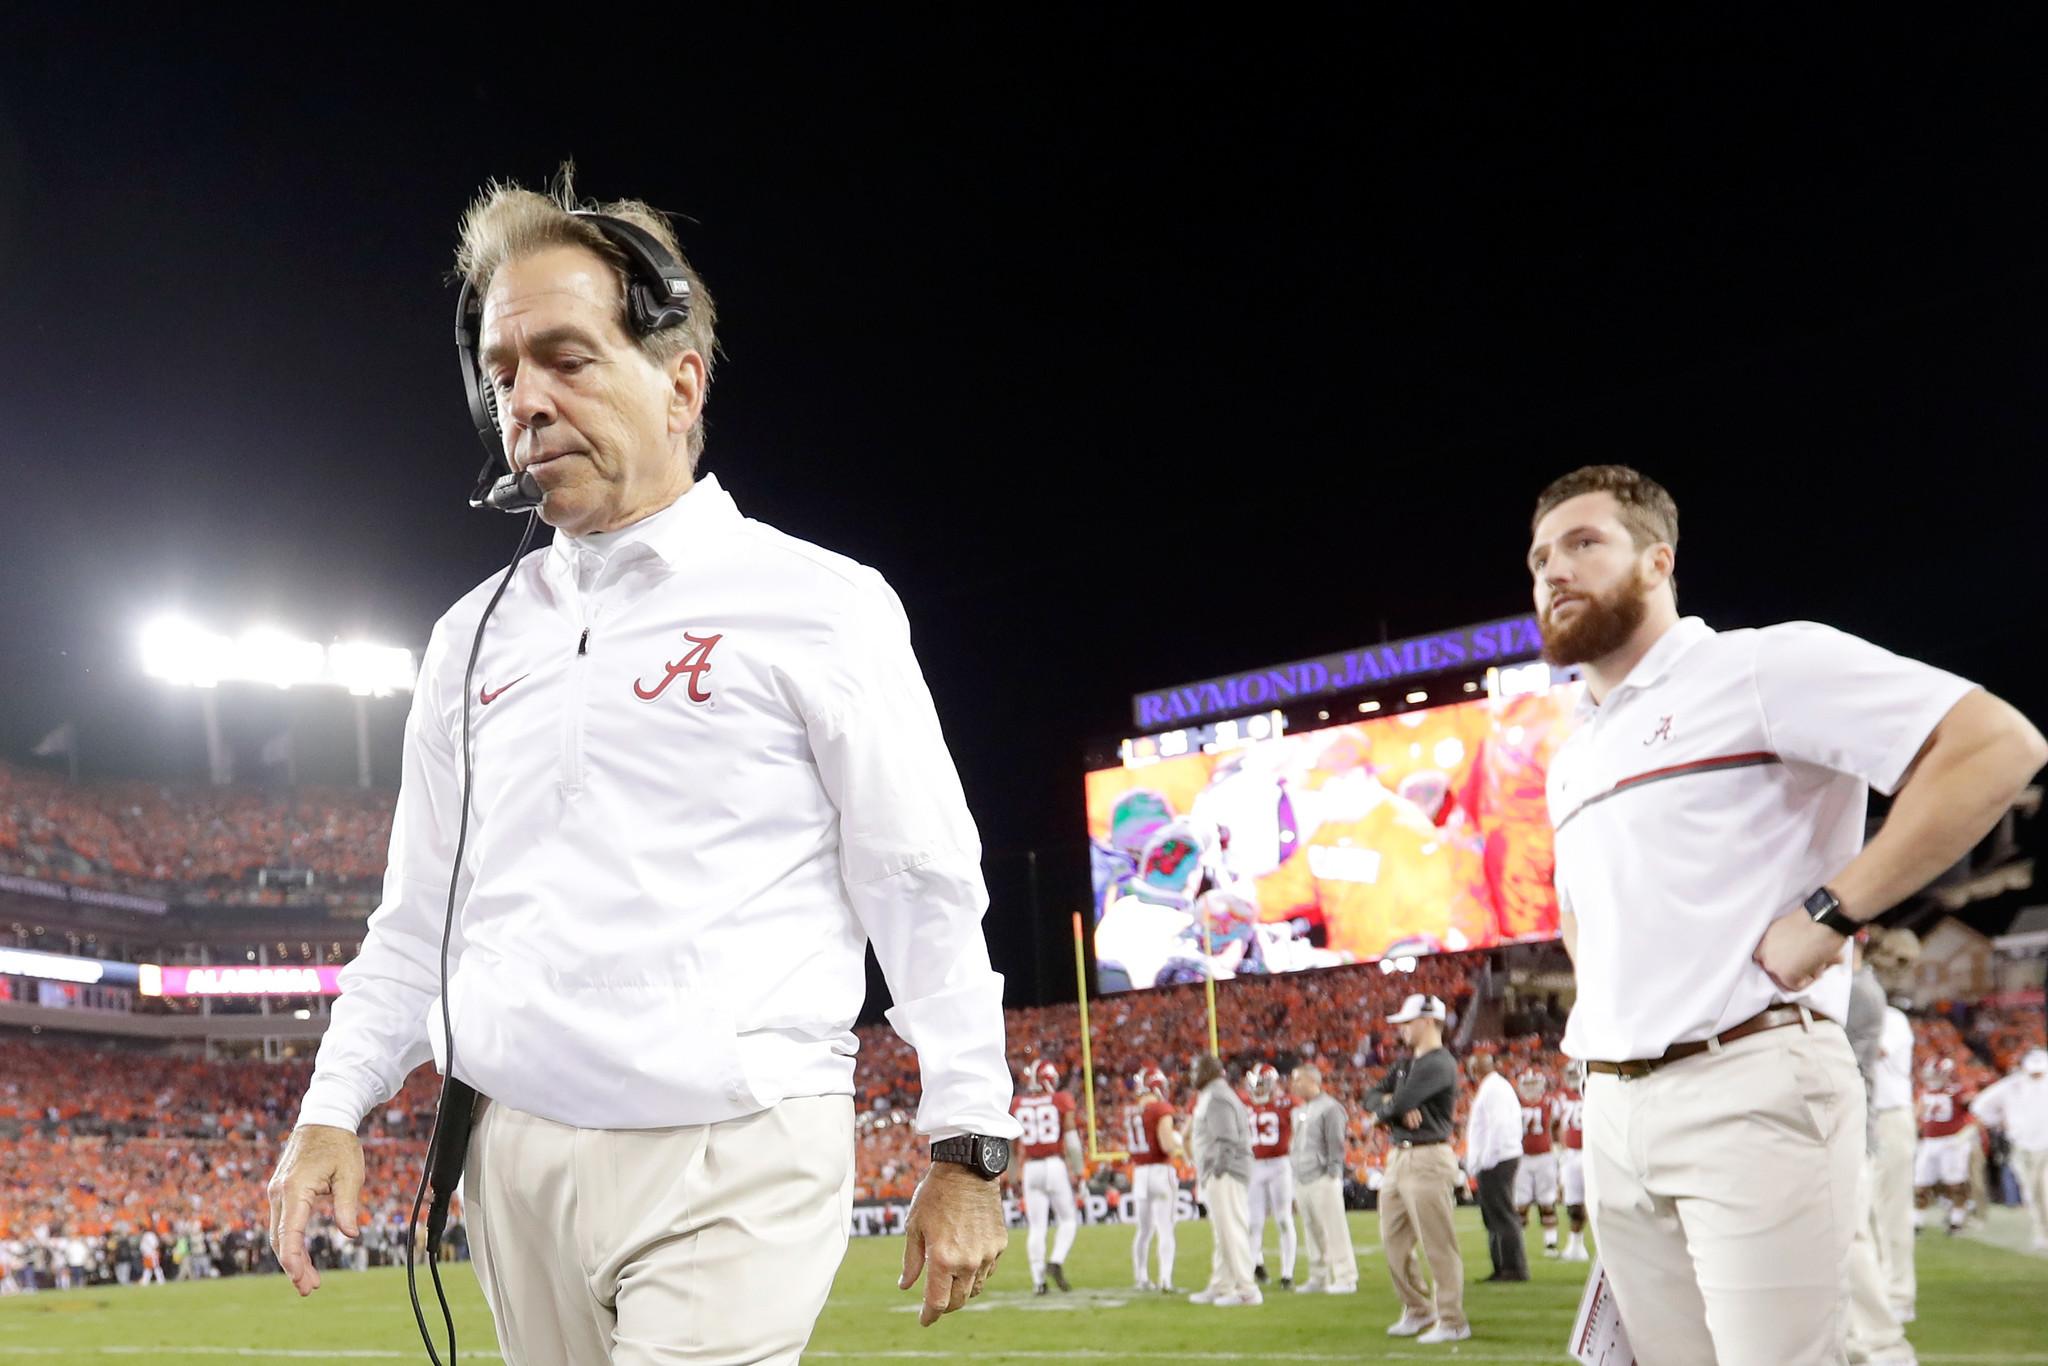 Why Millions Rejoiced At Alabama Coach Nick Saban S Loss To Clemson